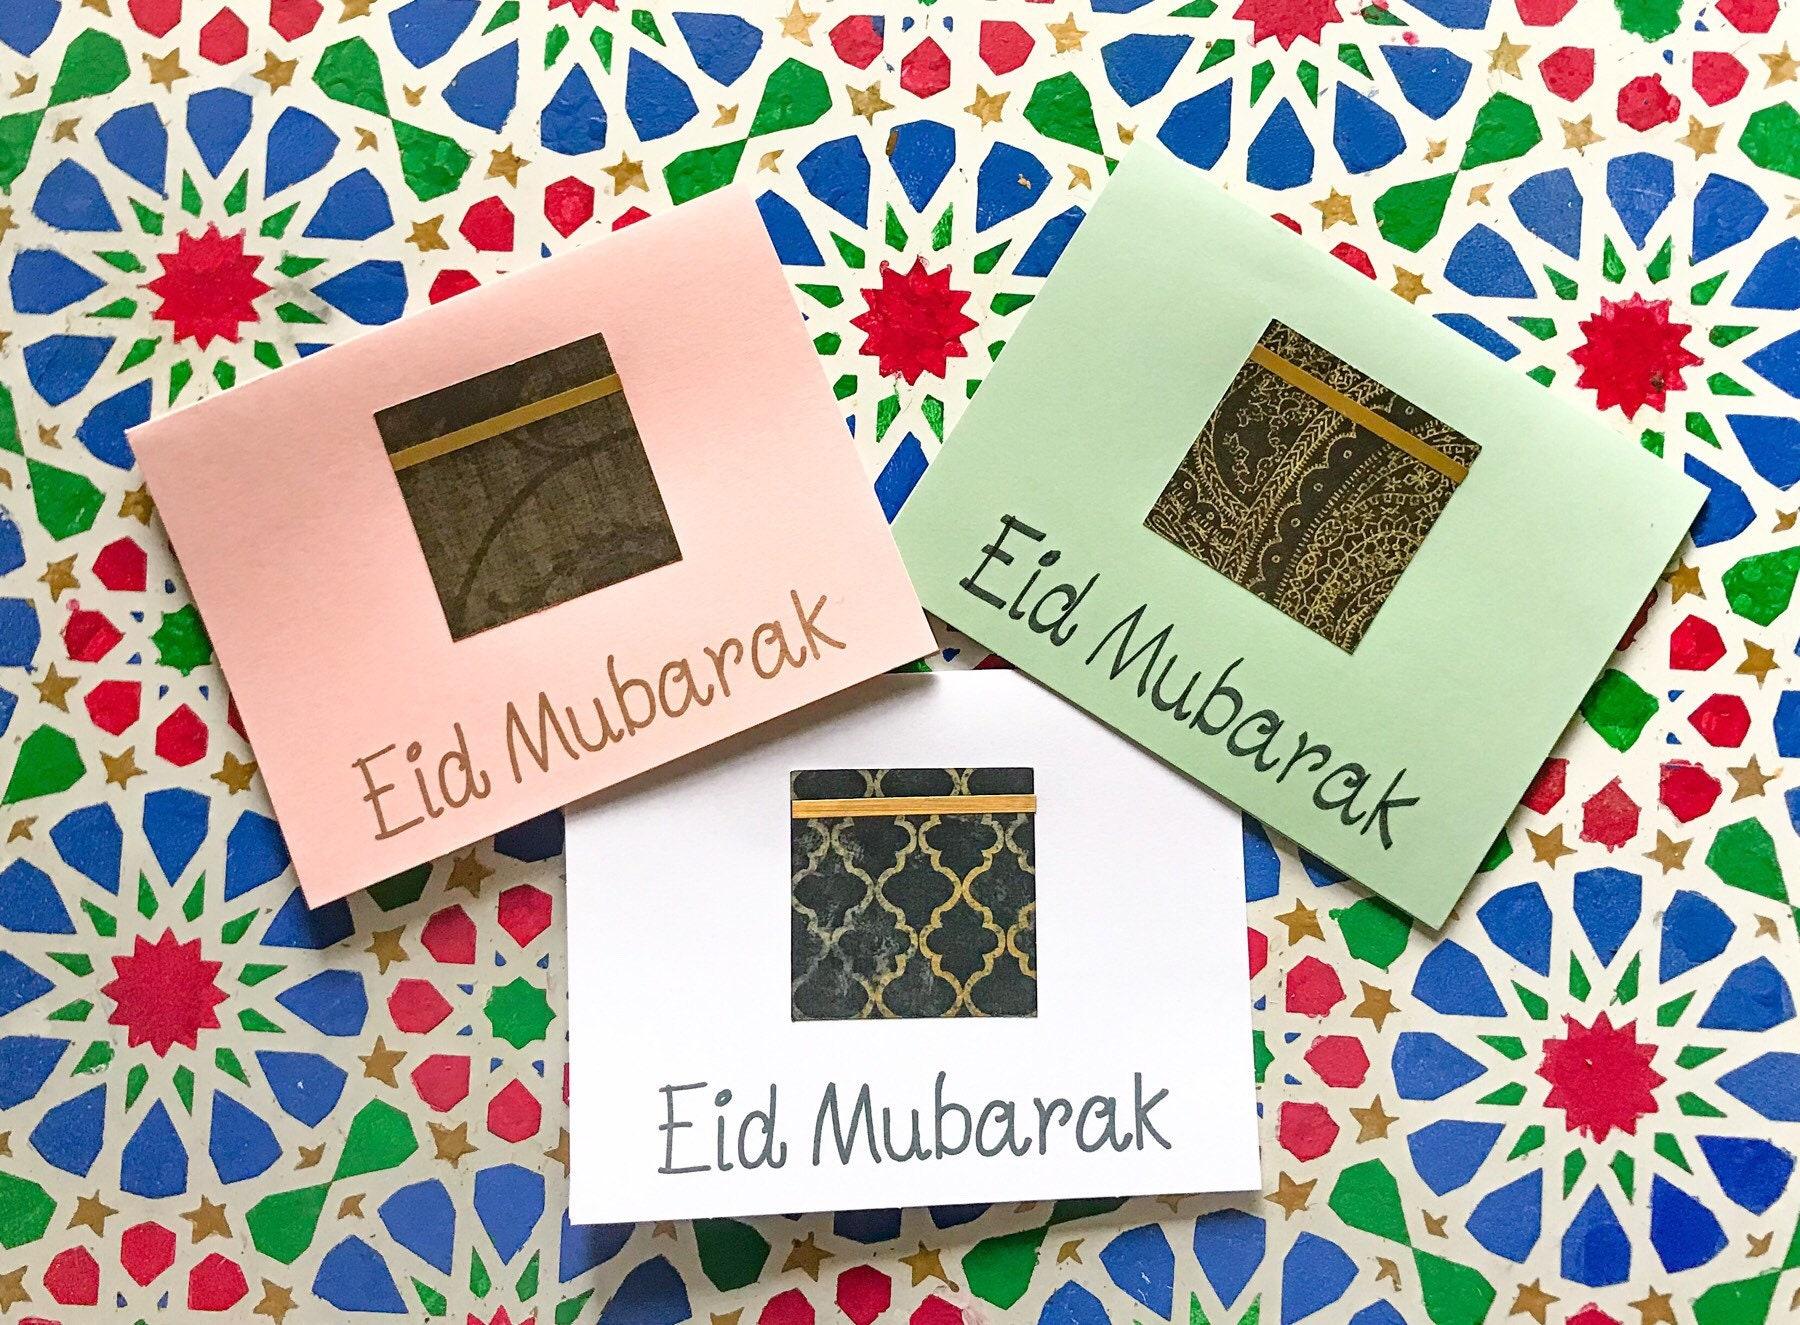 Eid Mubarak Or Hajj Mubarak Greeting Card